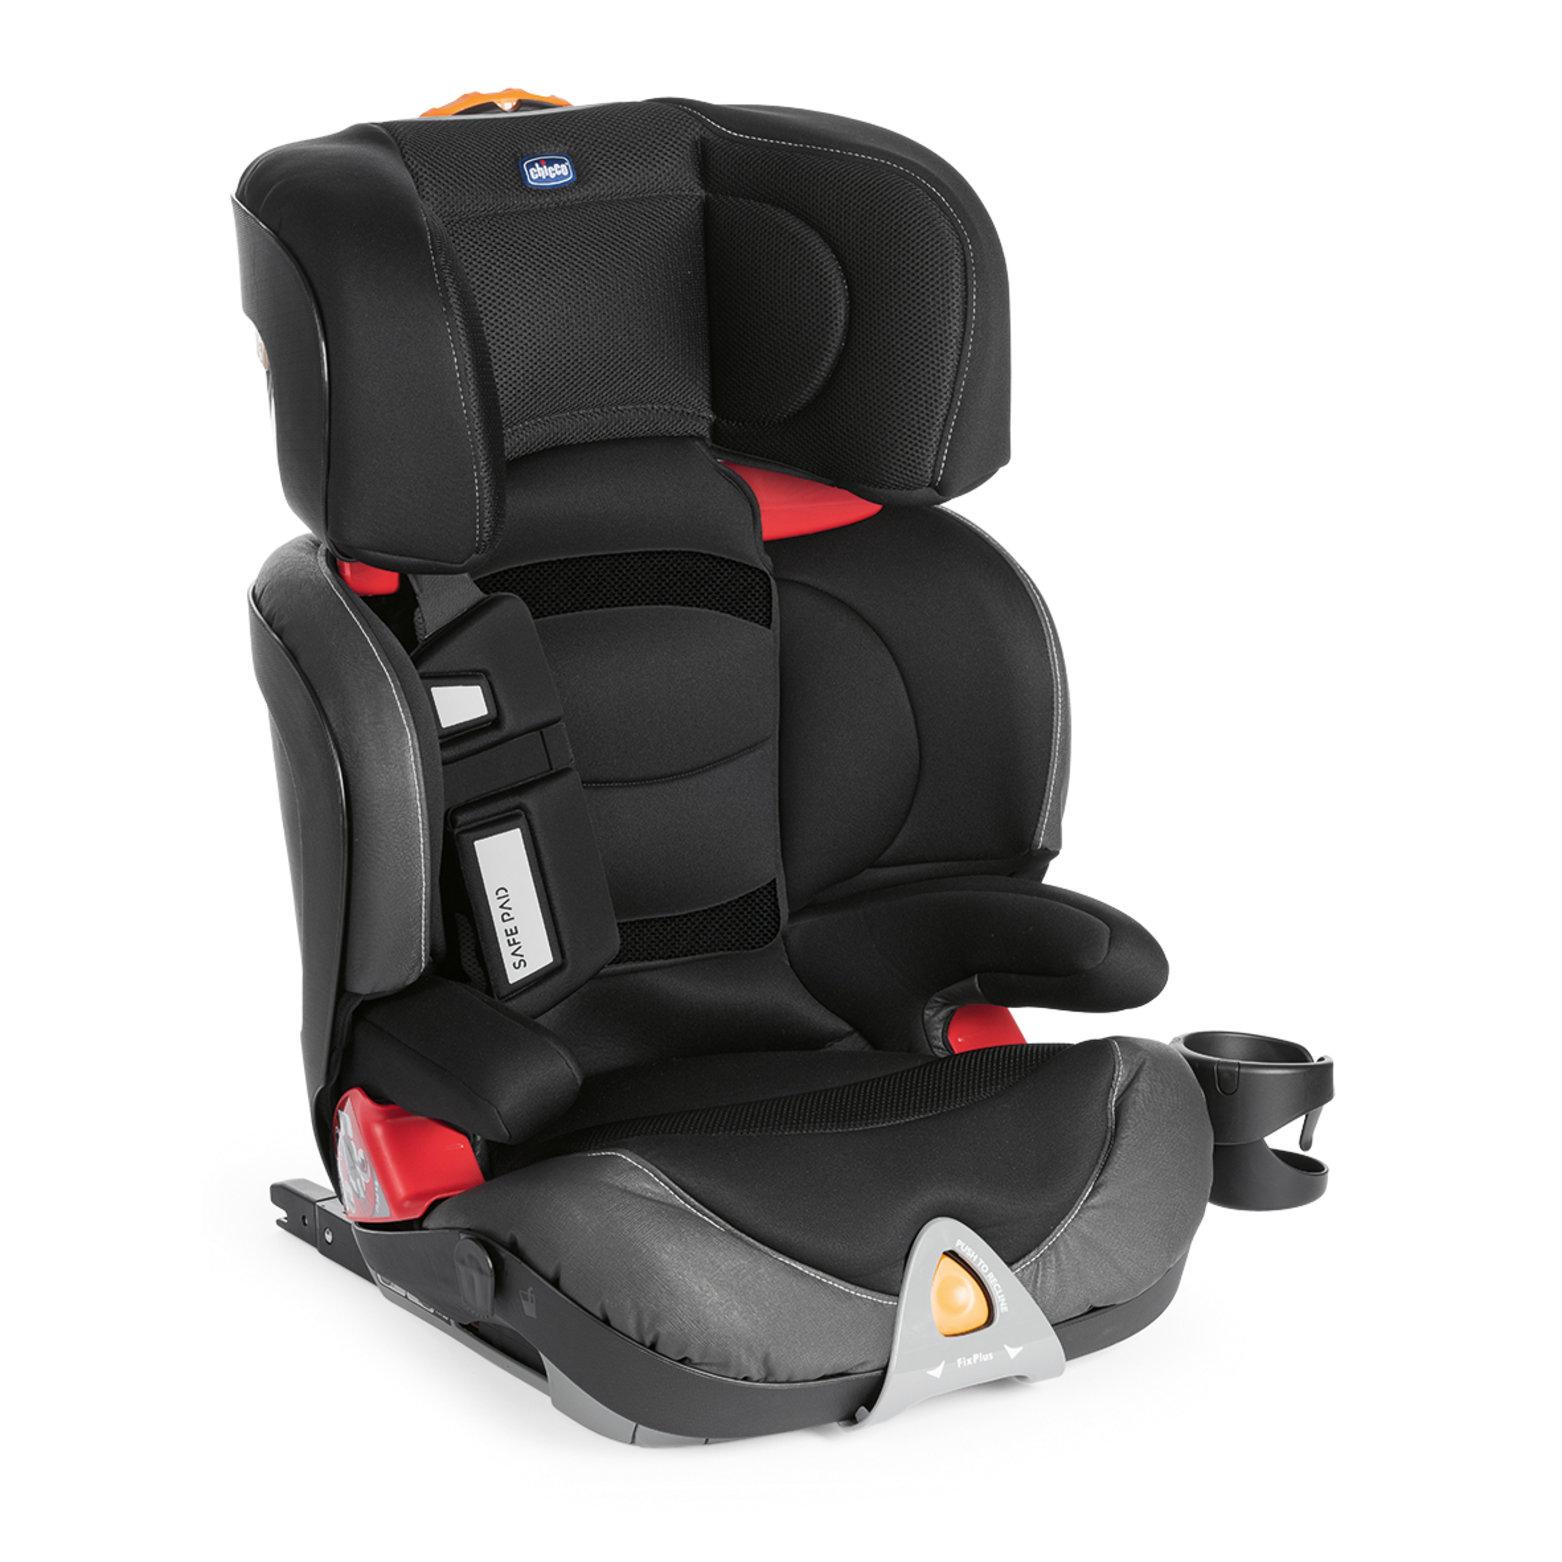 Autosedačka Oasys 2-3 FixPlus Evo - Jet Black 15-36kg